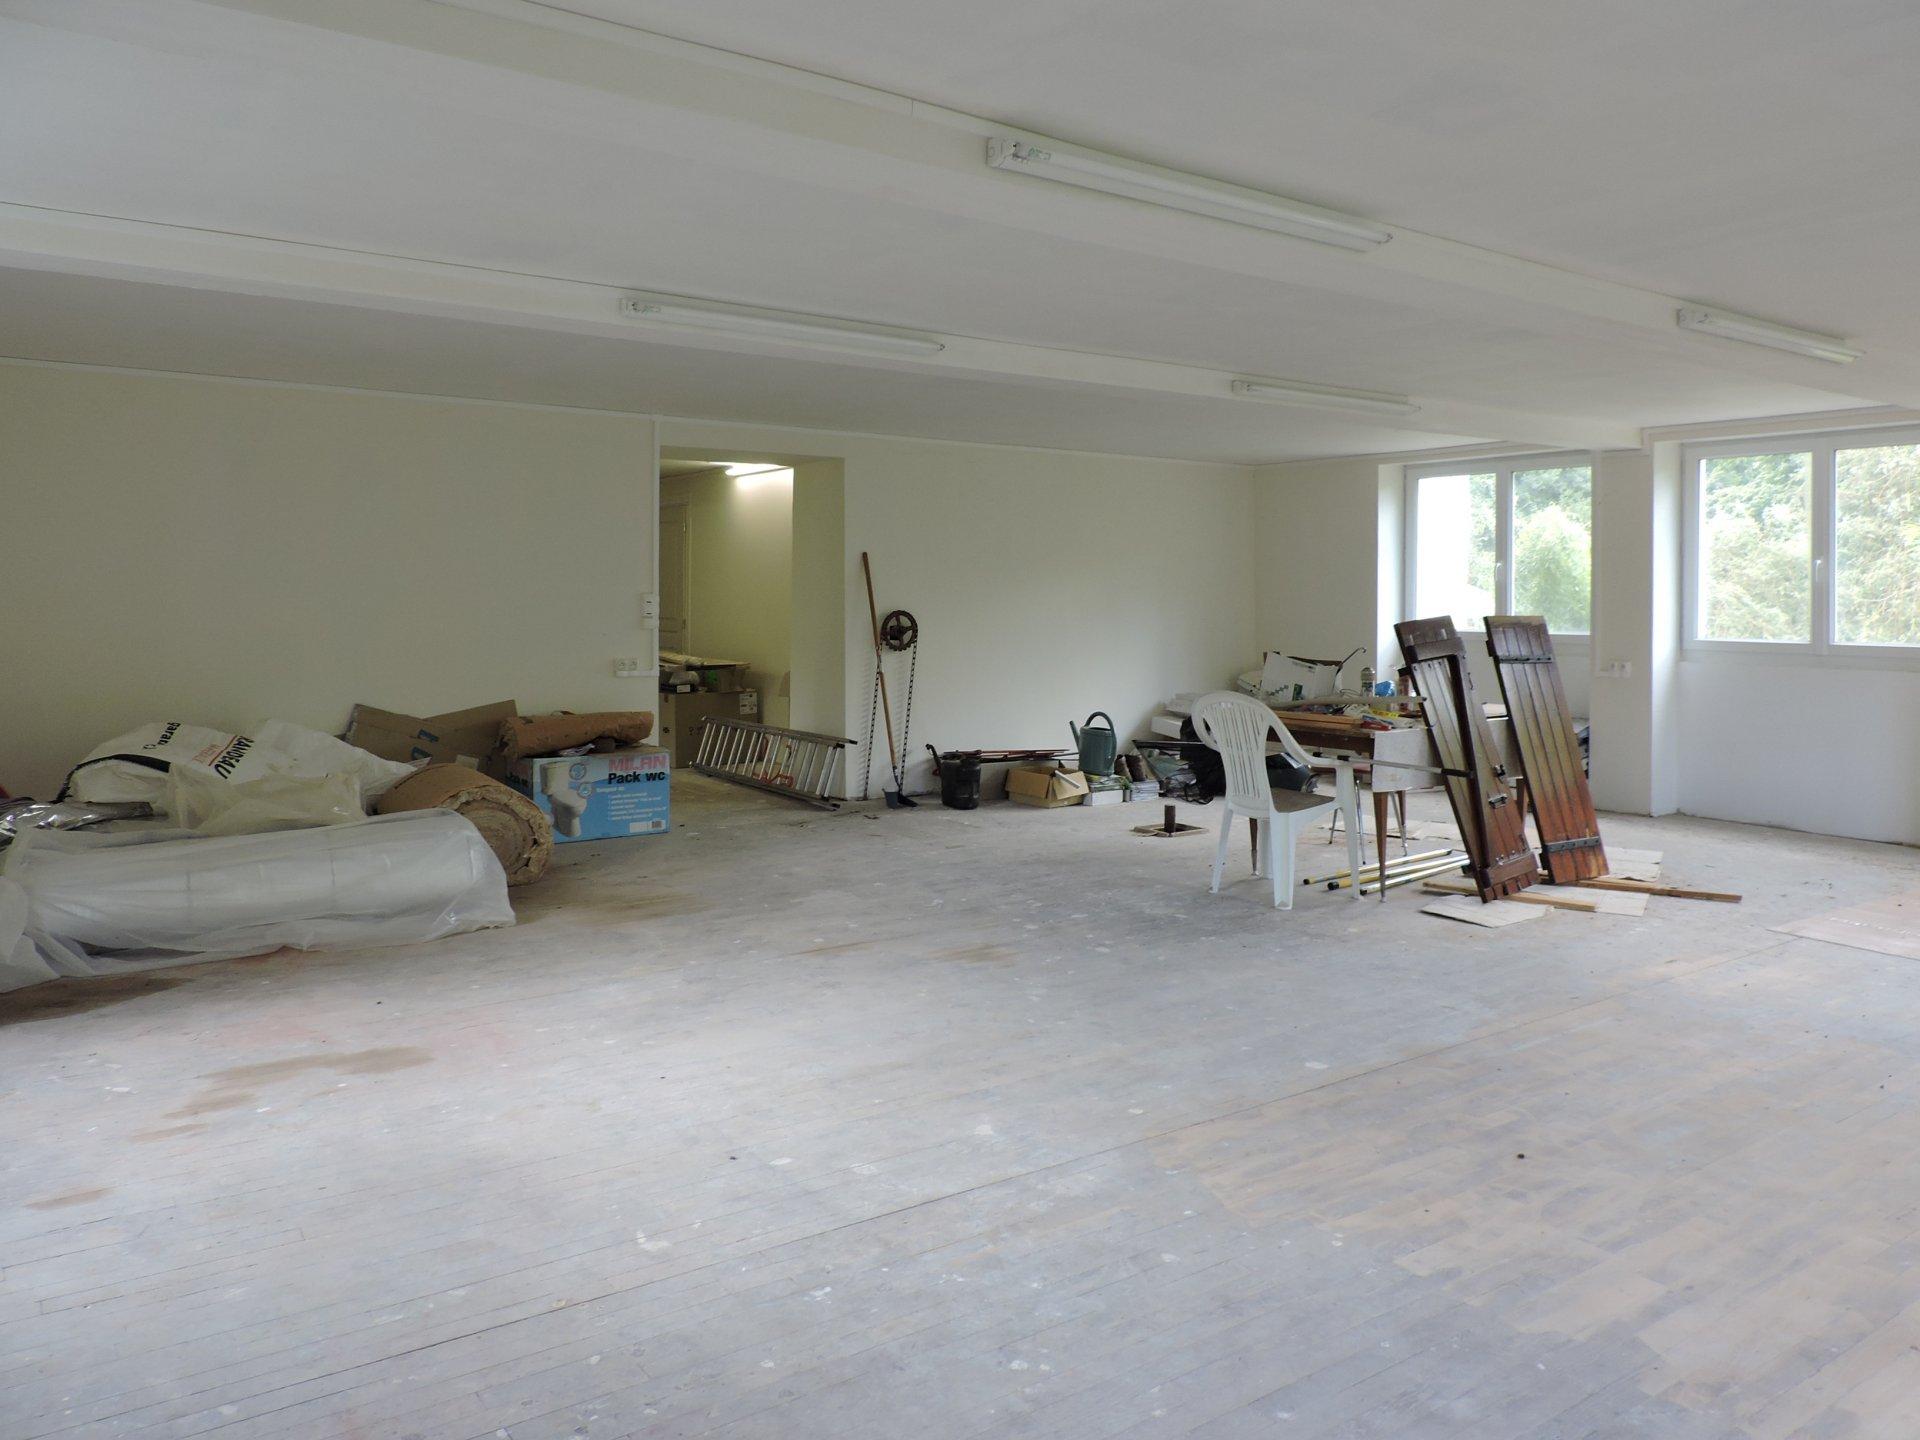 Reception room on the ground floor